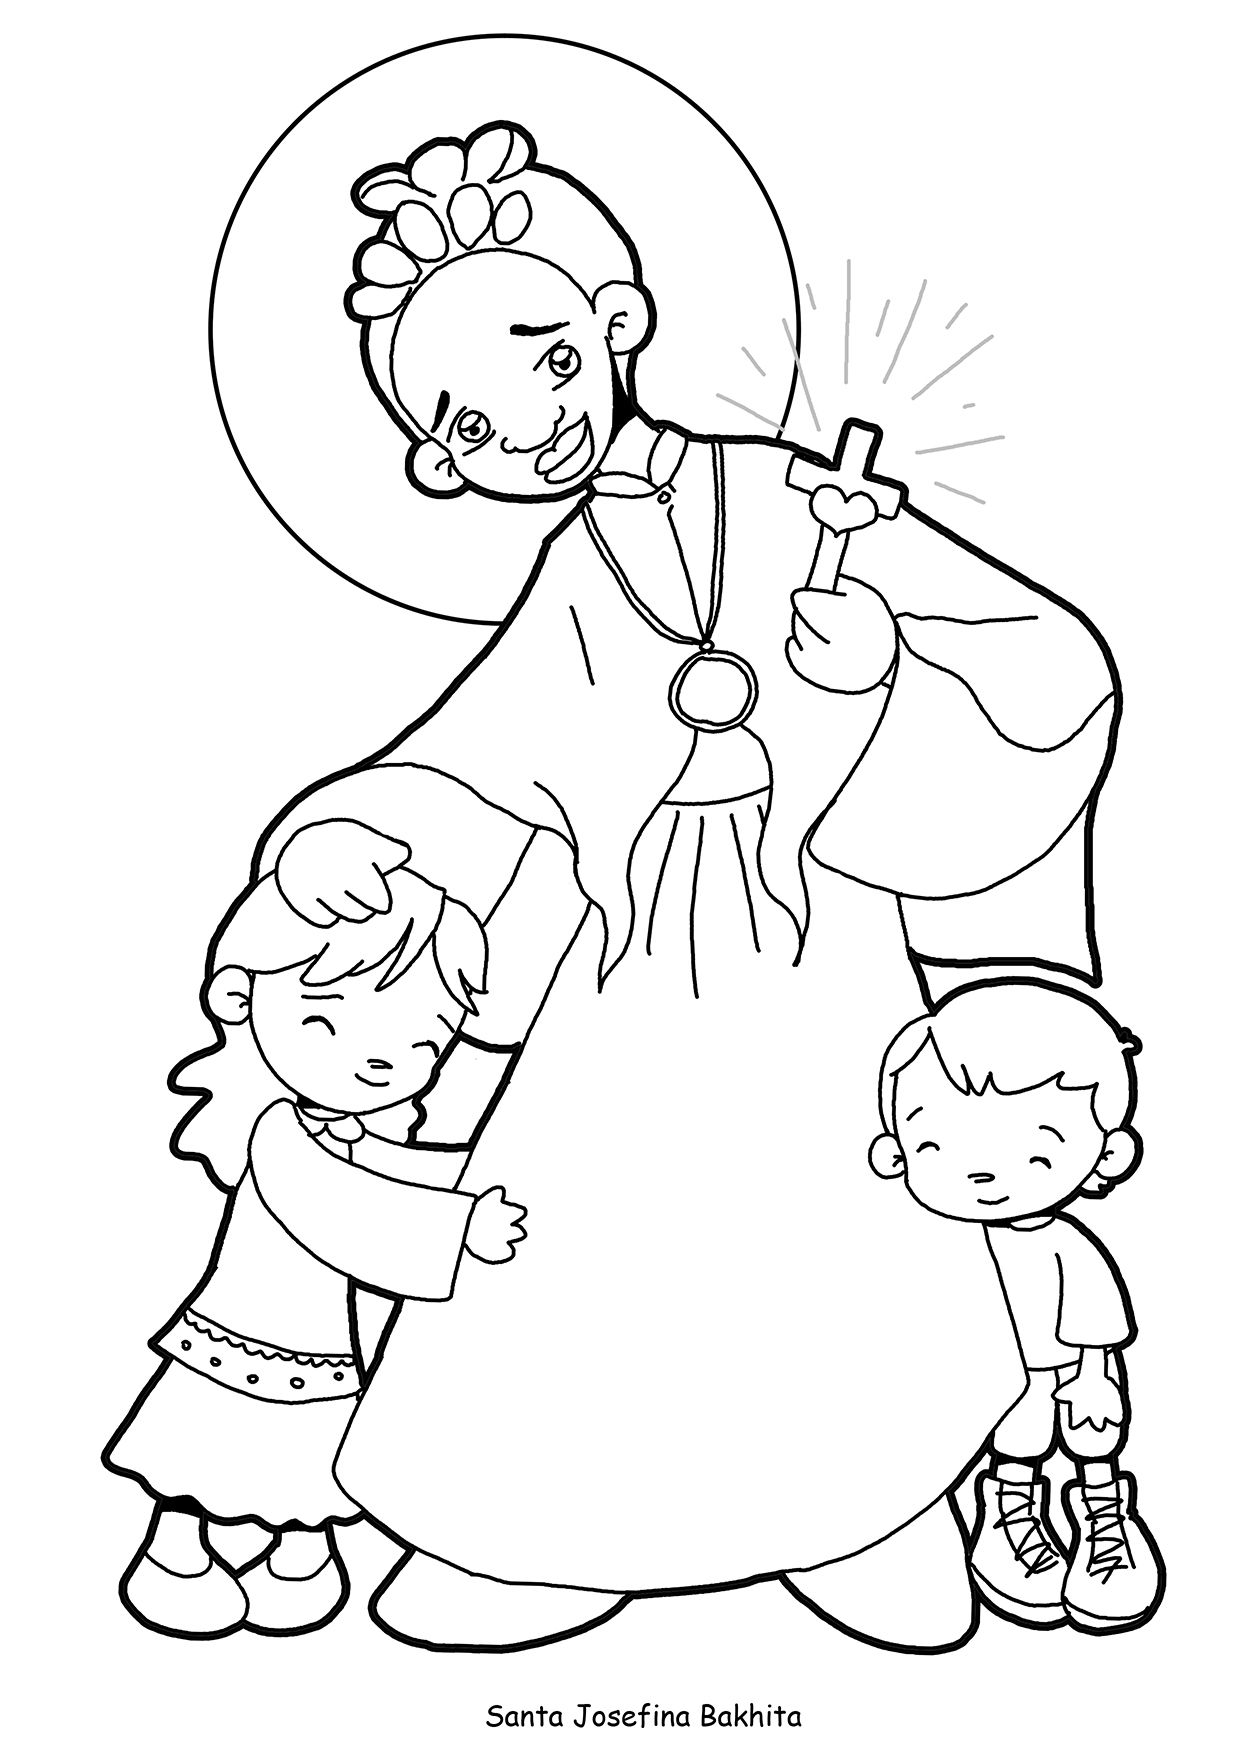 SANTA JOSEFINA BAKHITA para pintar. | Santas II | Pinterest | Pintar ...